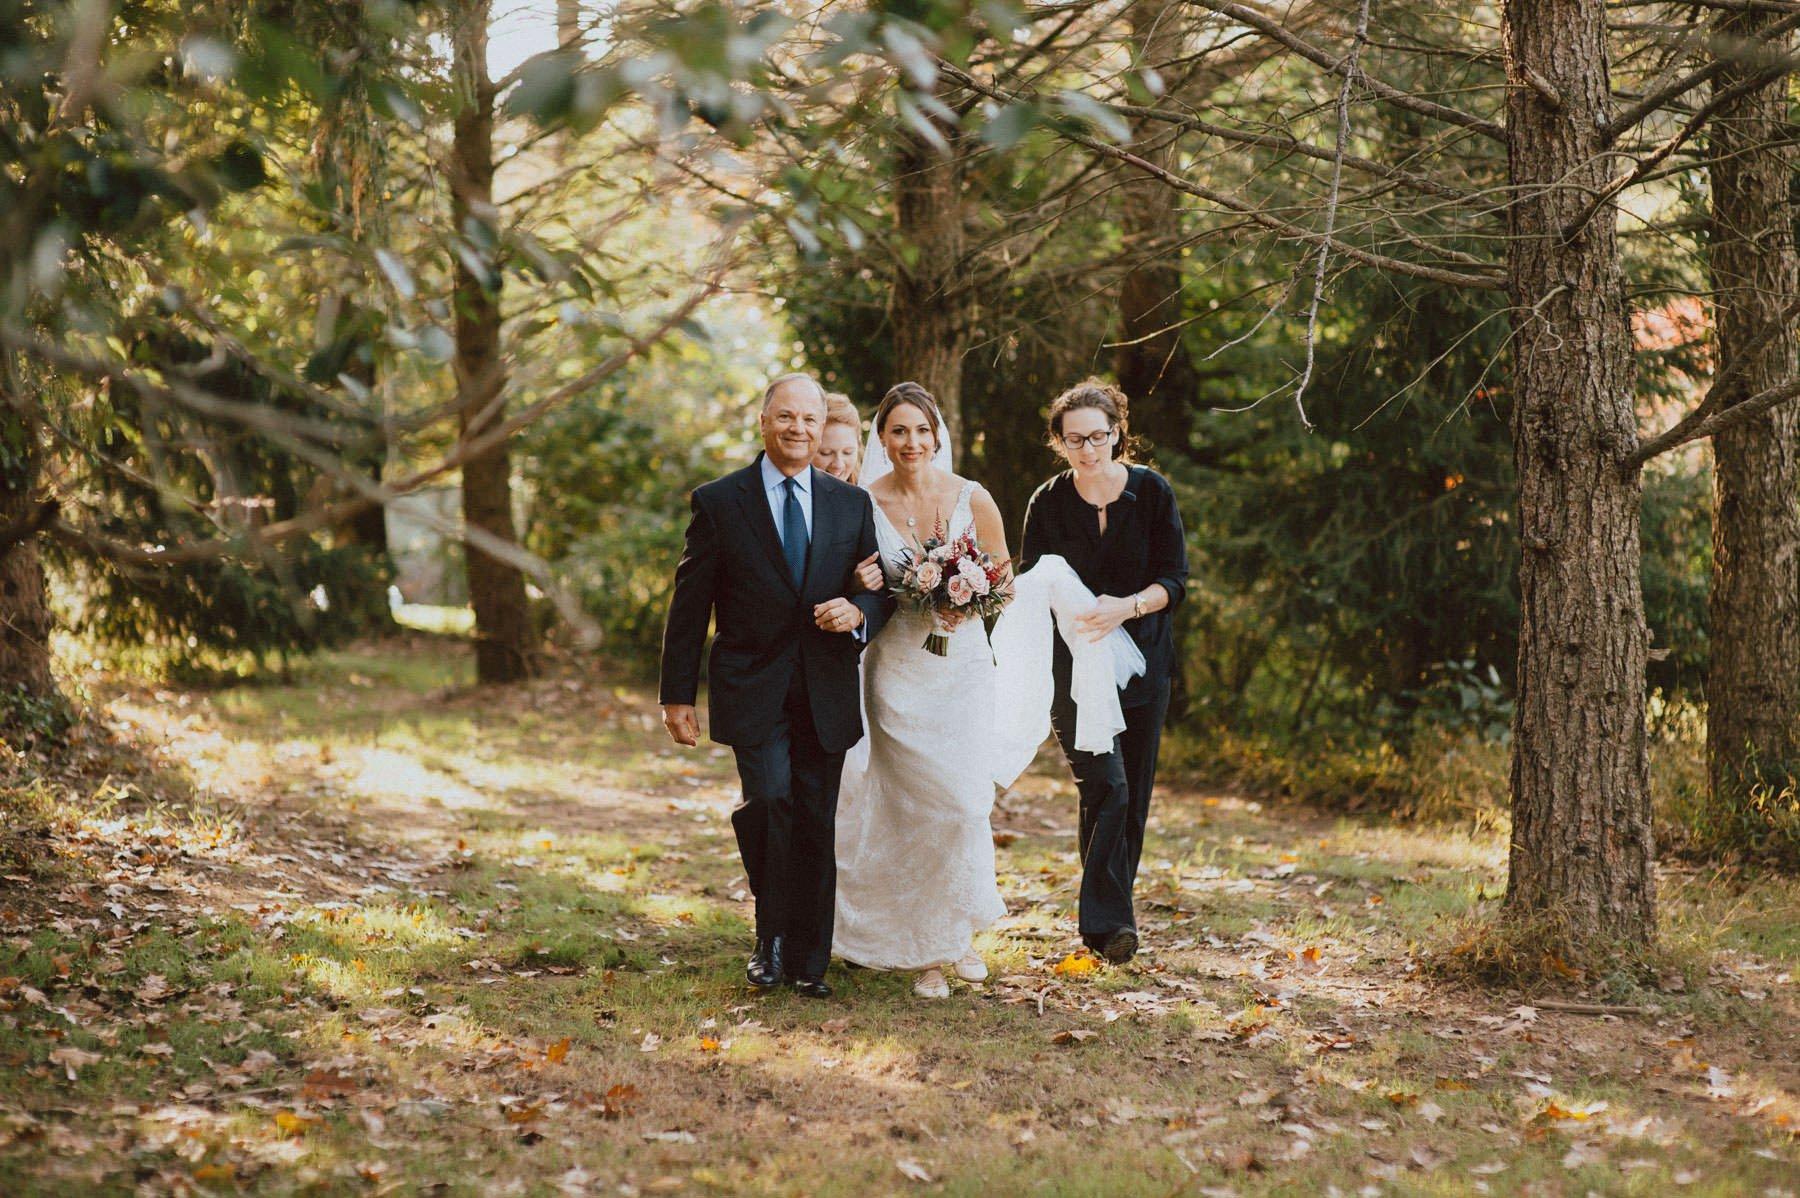 faunbrook-bed-and-breakfast-wedding-56.jpg